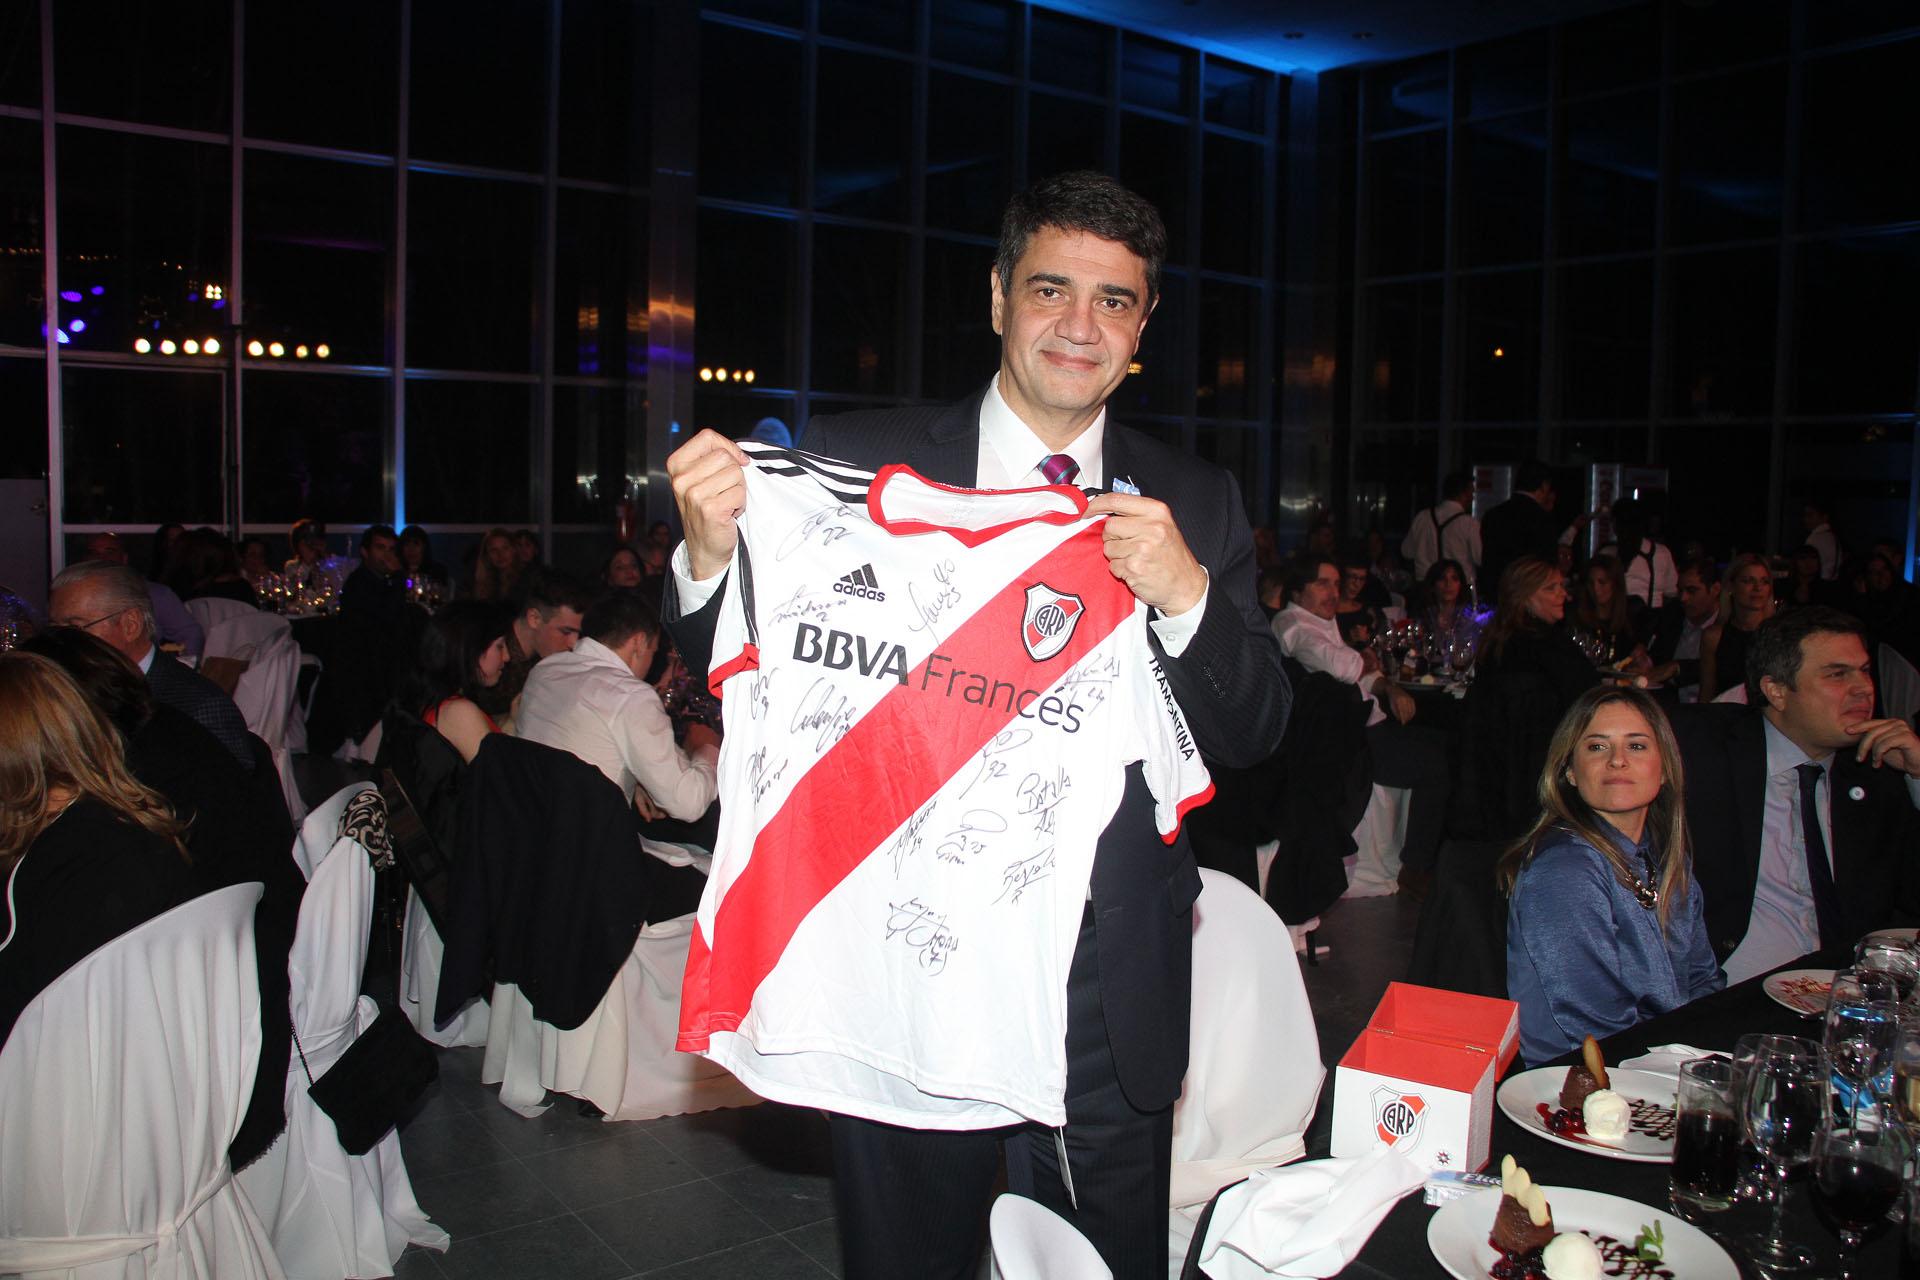 El intendente Jorge Macri obtuvo una camiseta de River autografiada que se remató en la cena